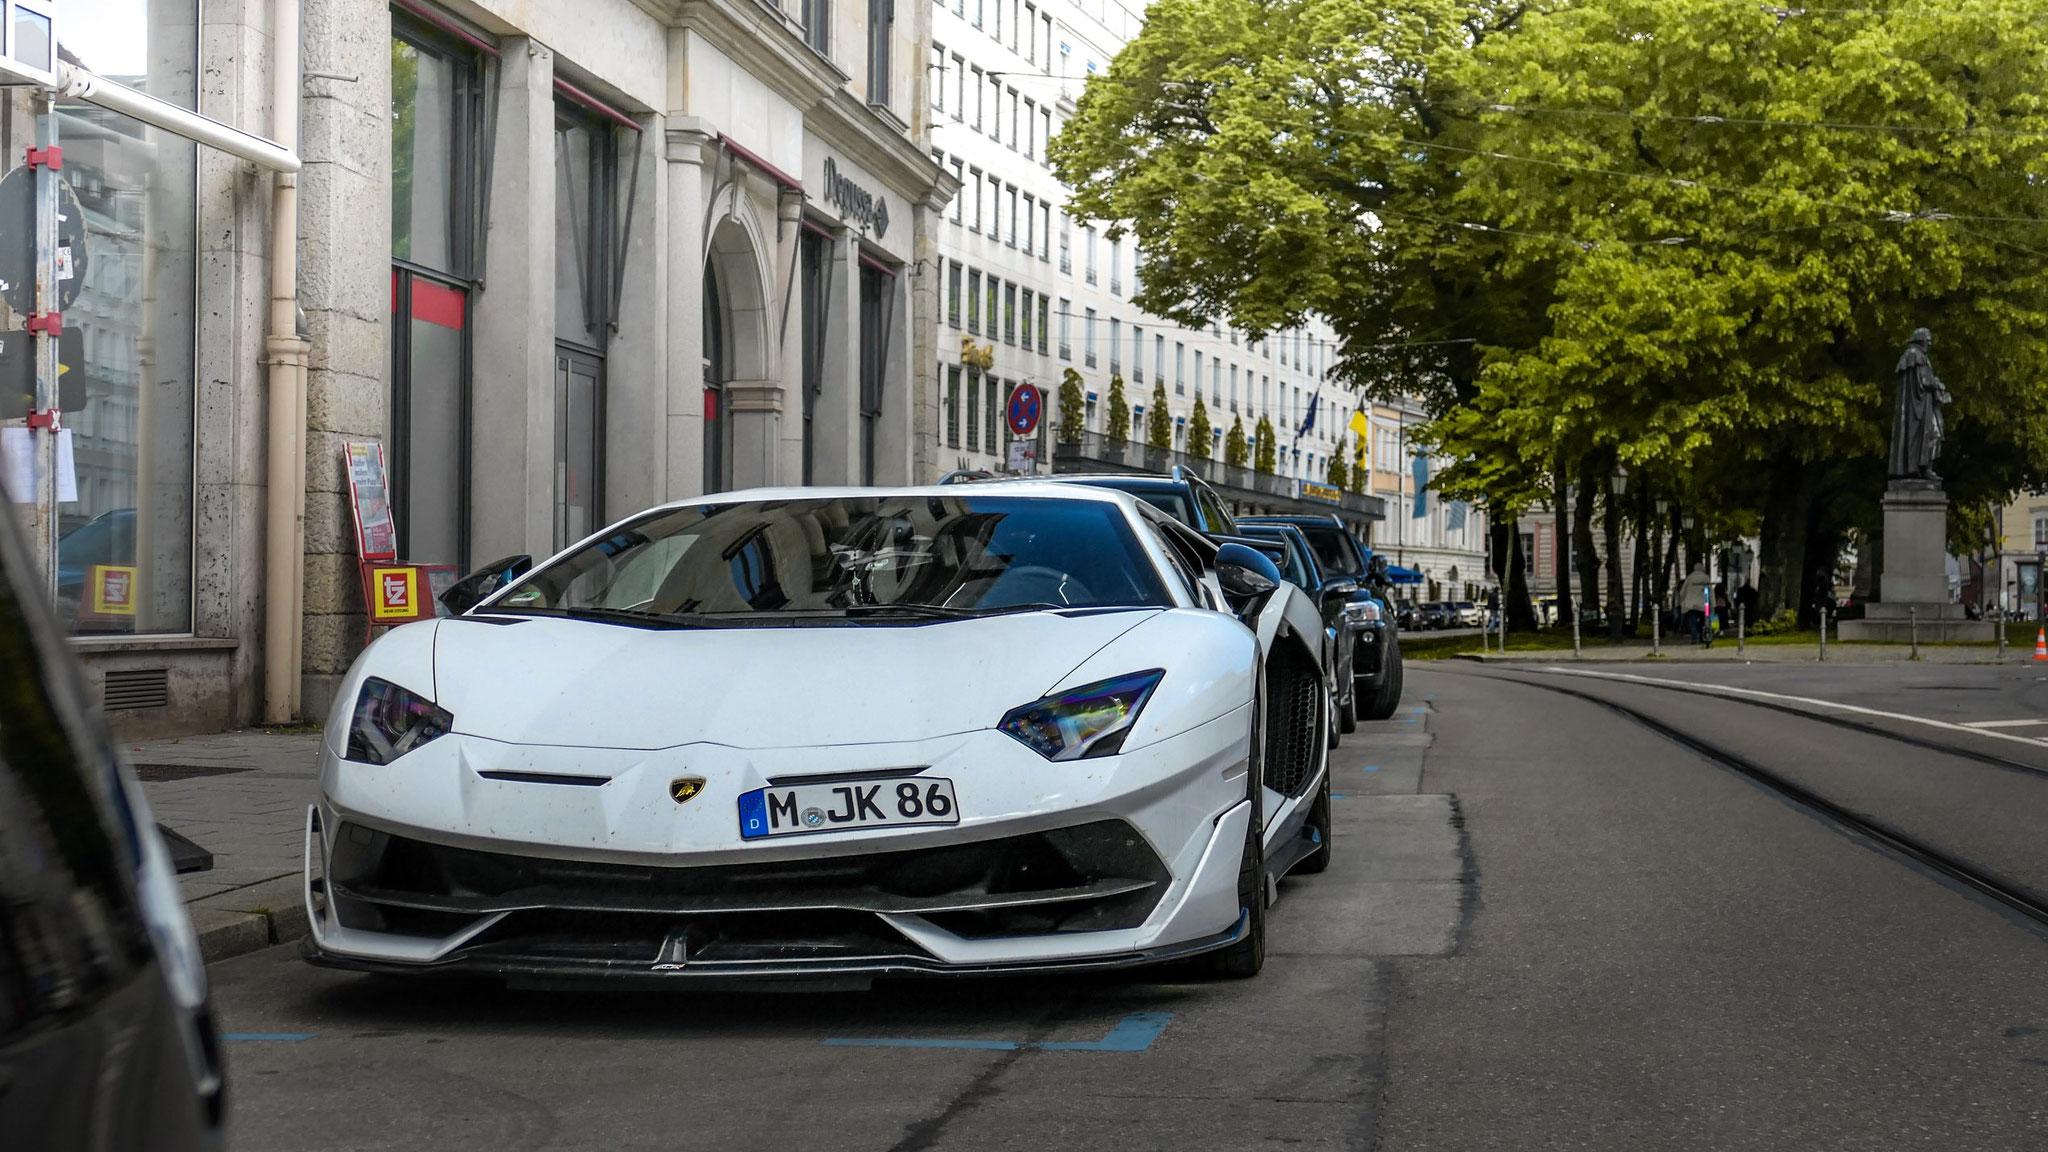 Lamborghini Aventador LP 770 SVJ - M-JK-86